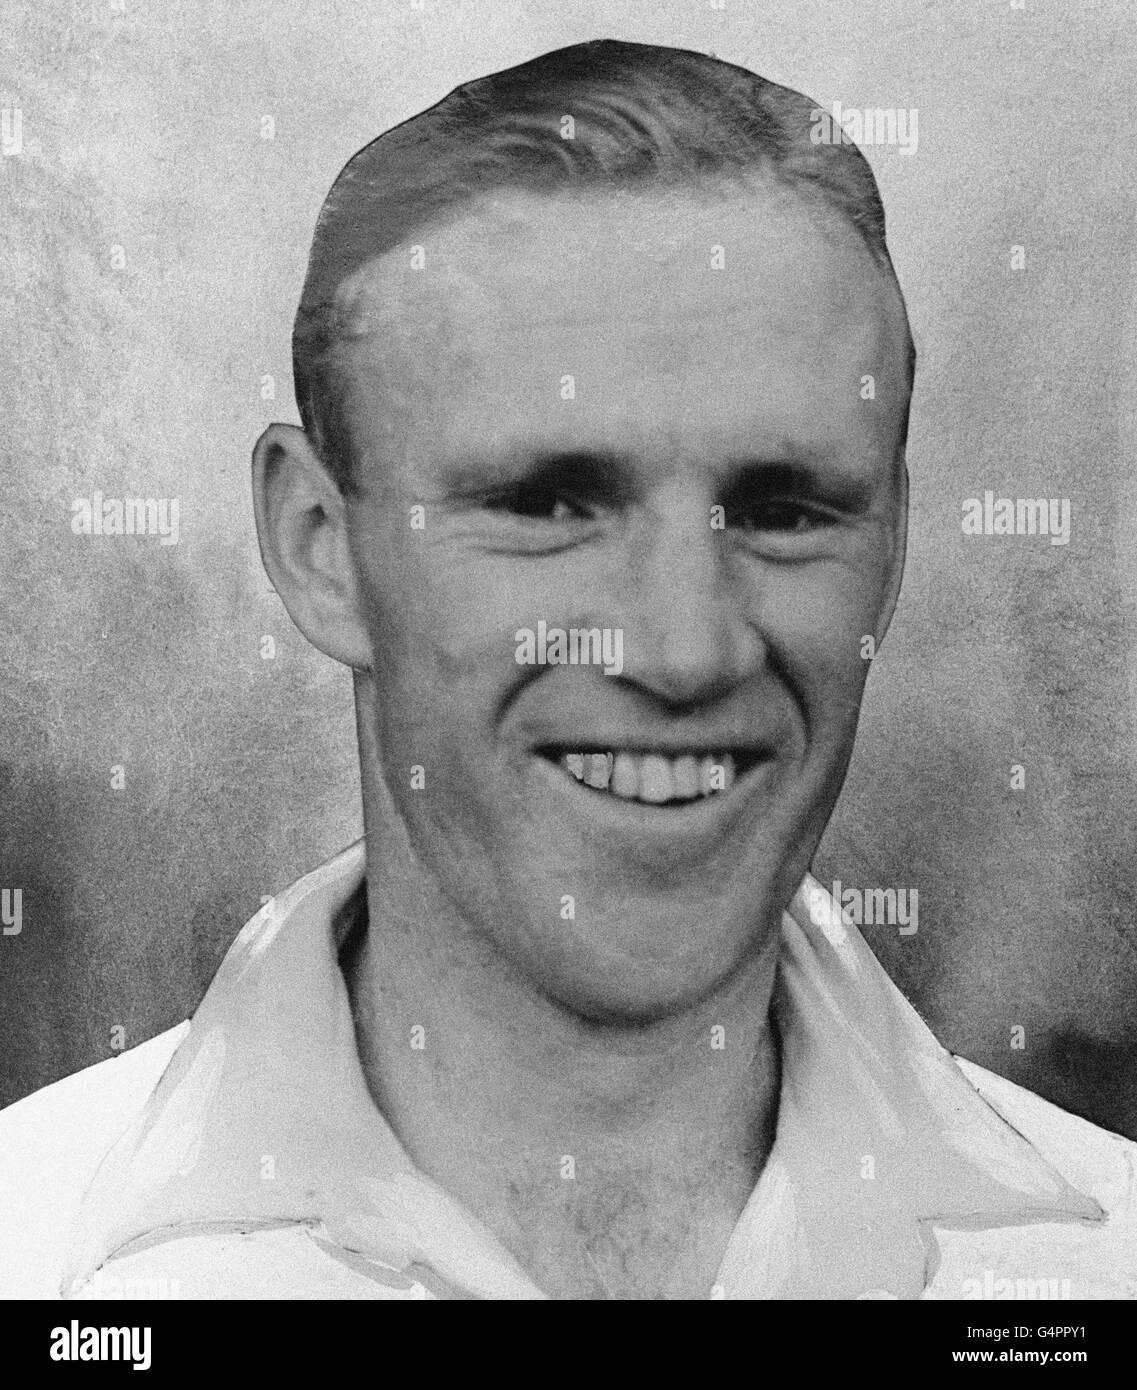 Cricket - Australia Head Shots - Stock Image